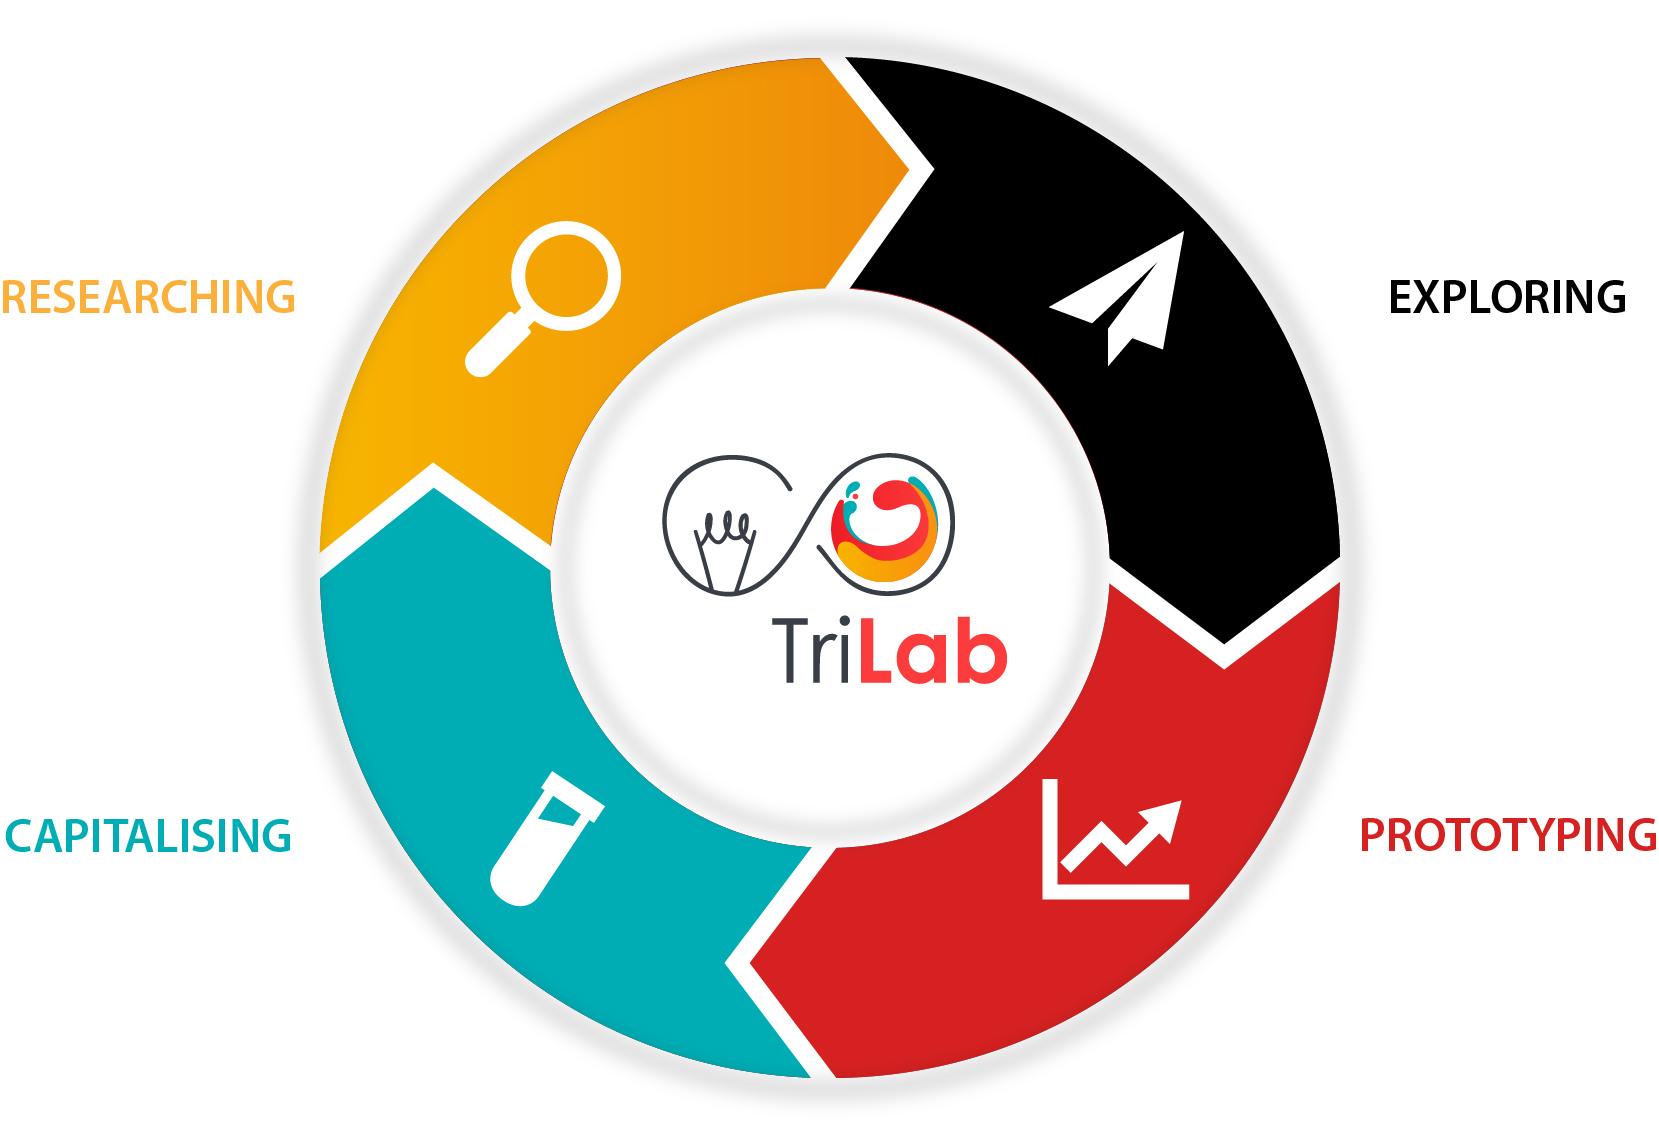 Trilab's principles